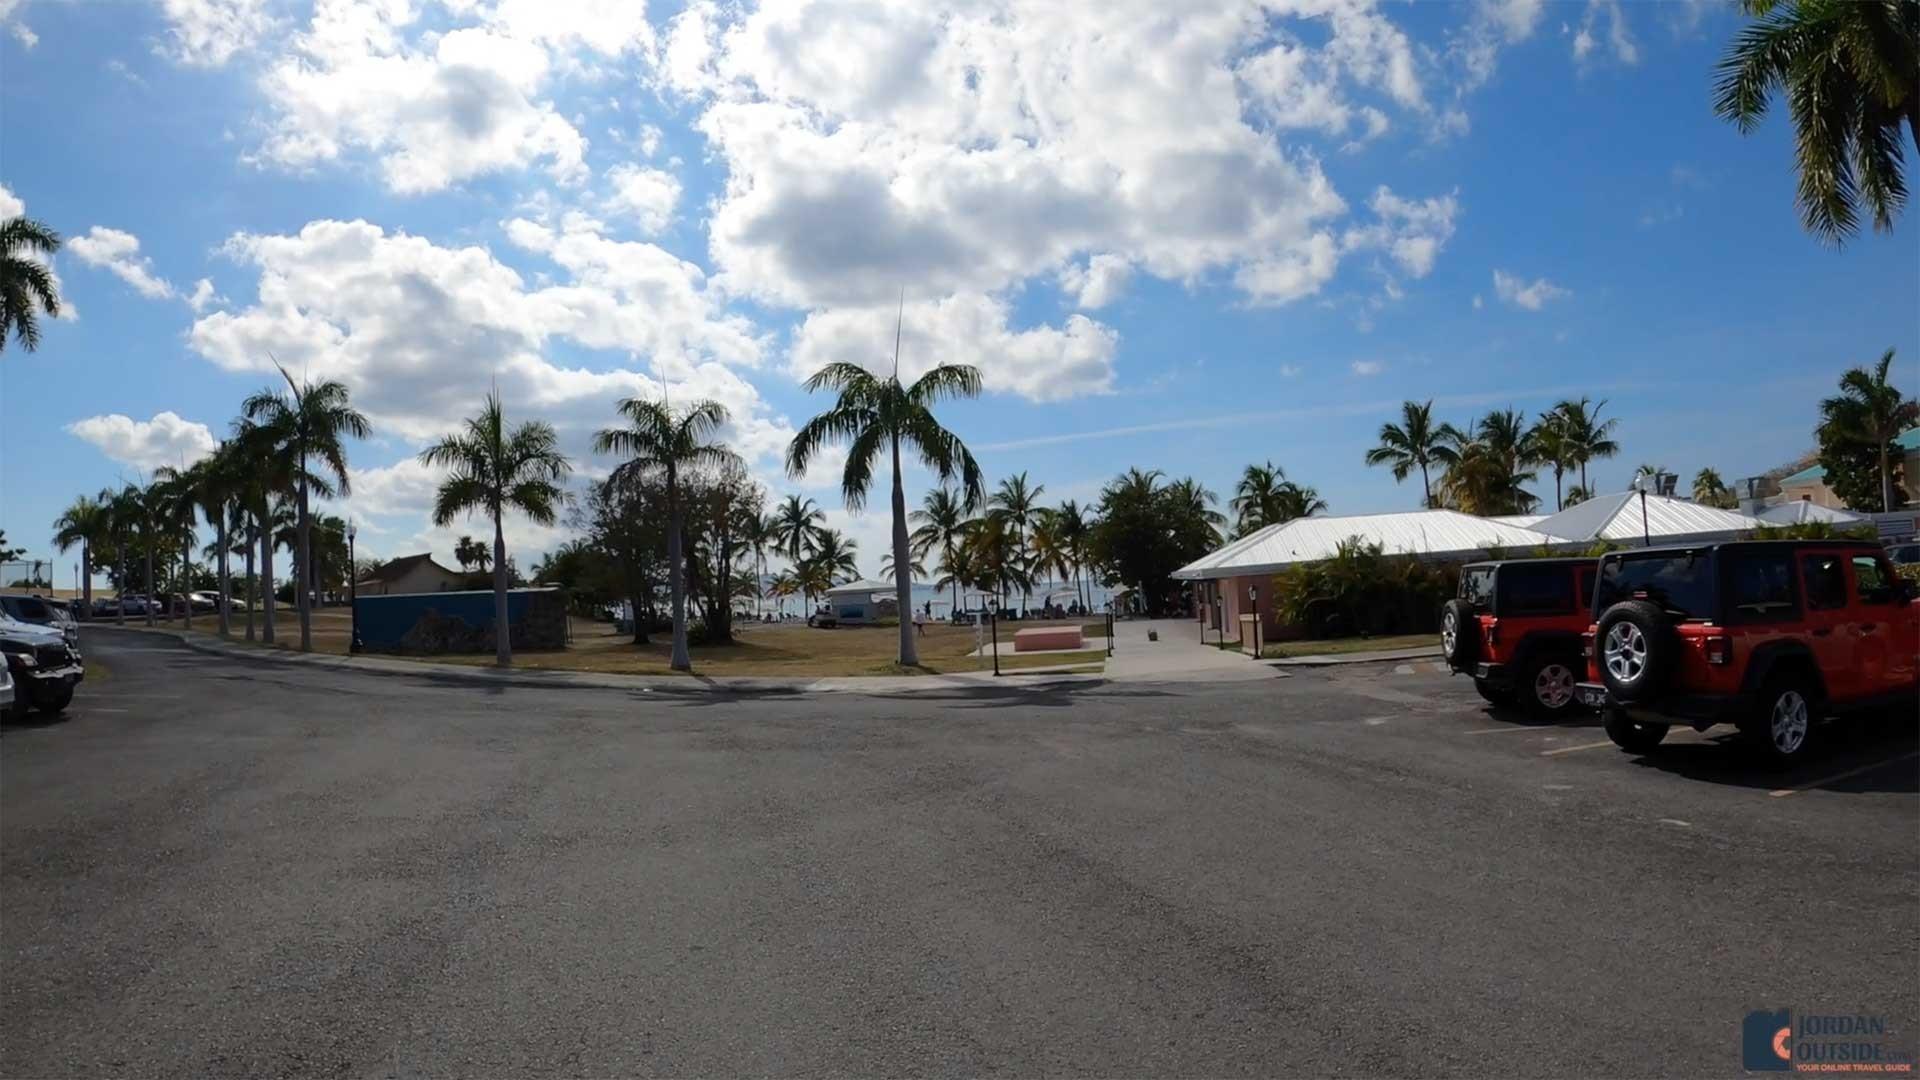 The Parking Lot at Mermaid Beach